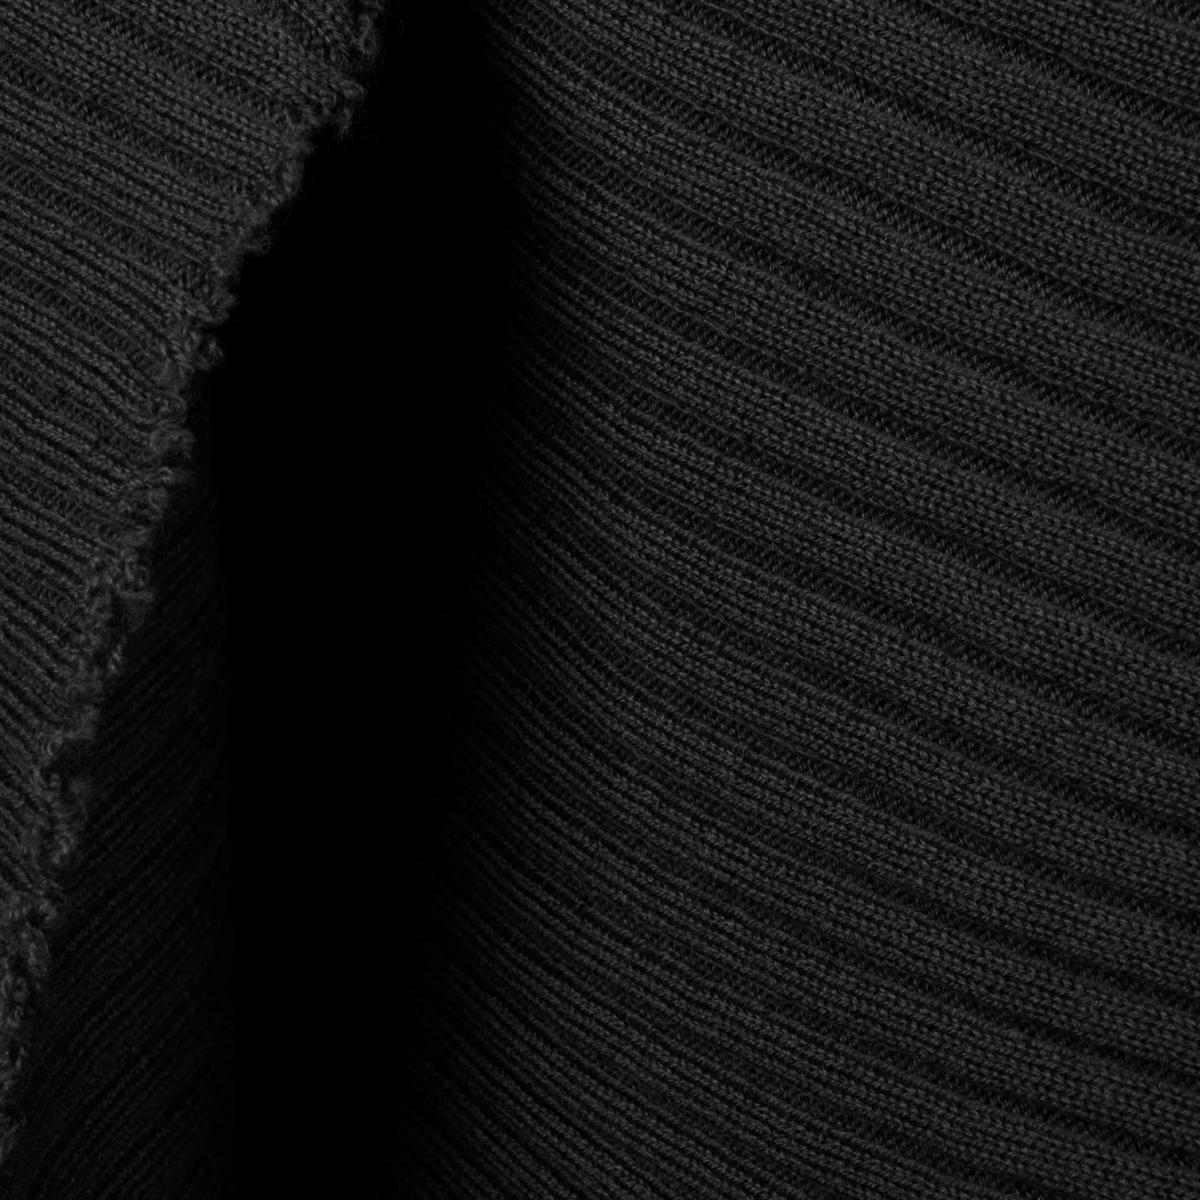 Marques Almeida Merino Wool Asymmetric Draped Skirt Black Hervia